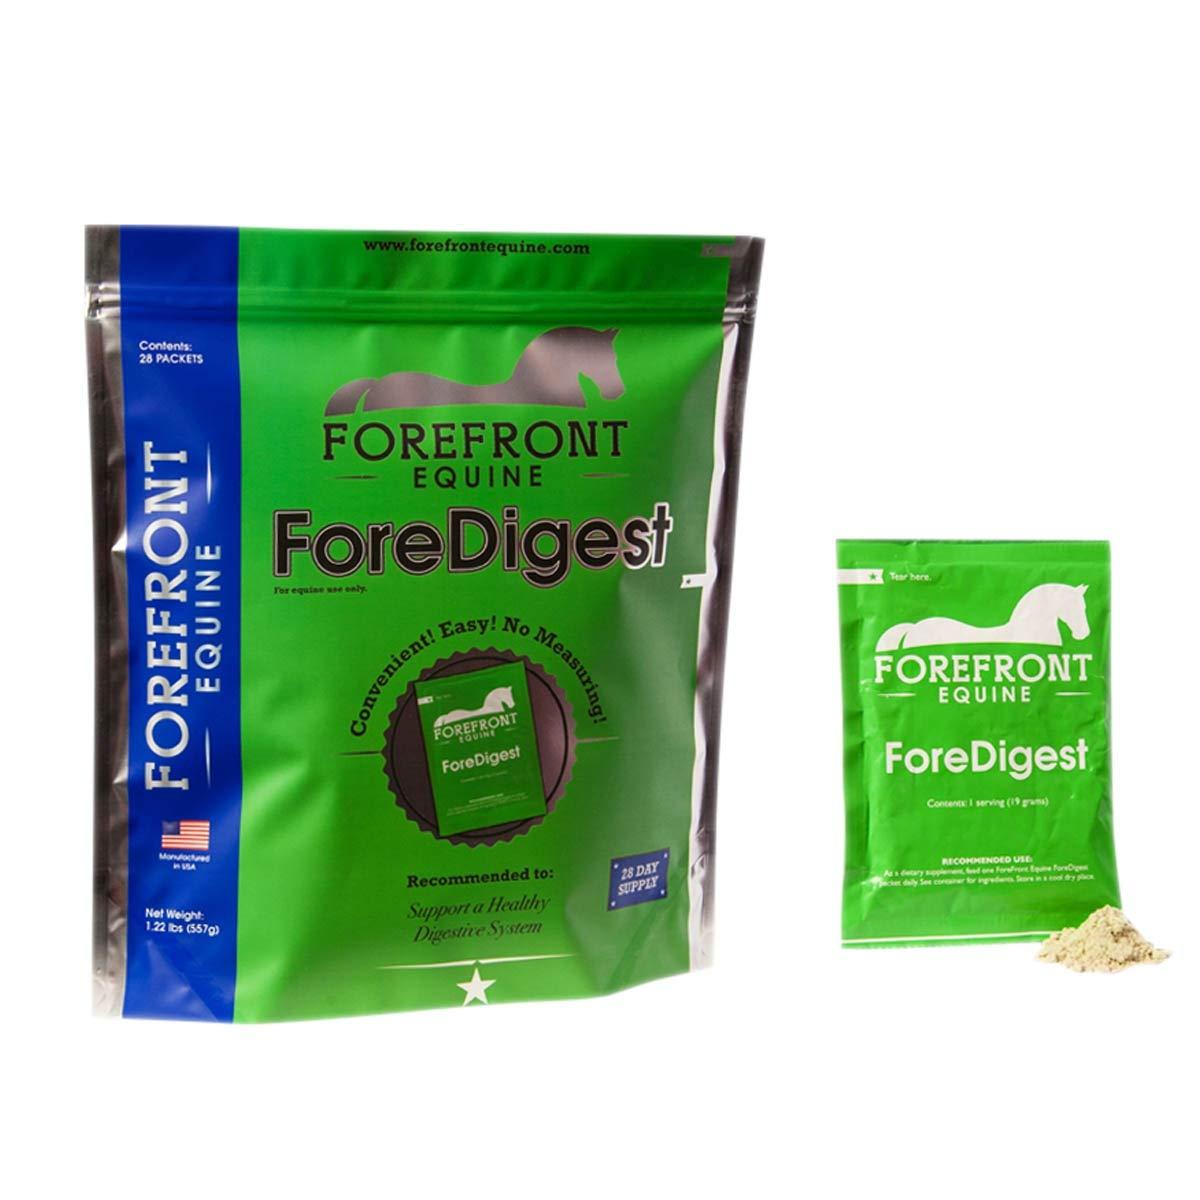 ForeDigest